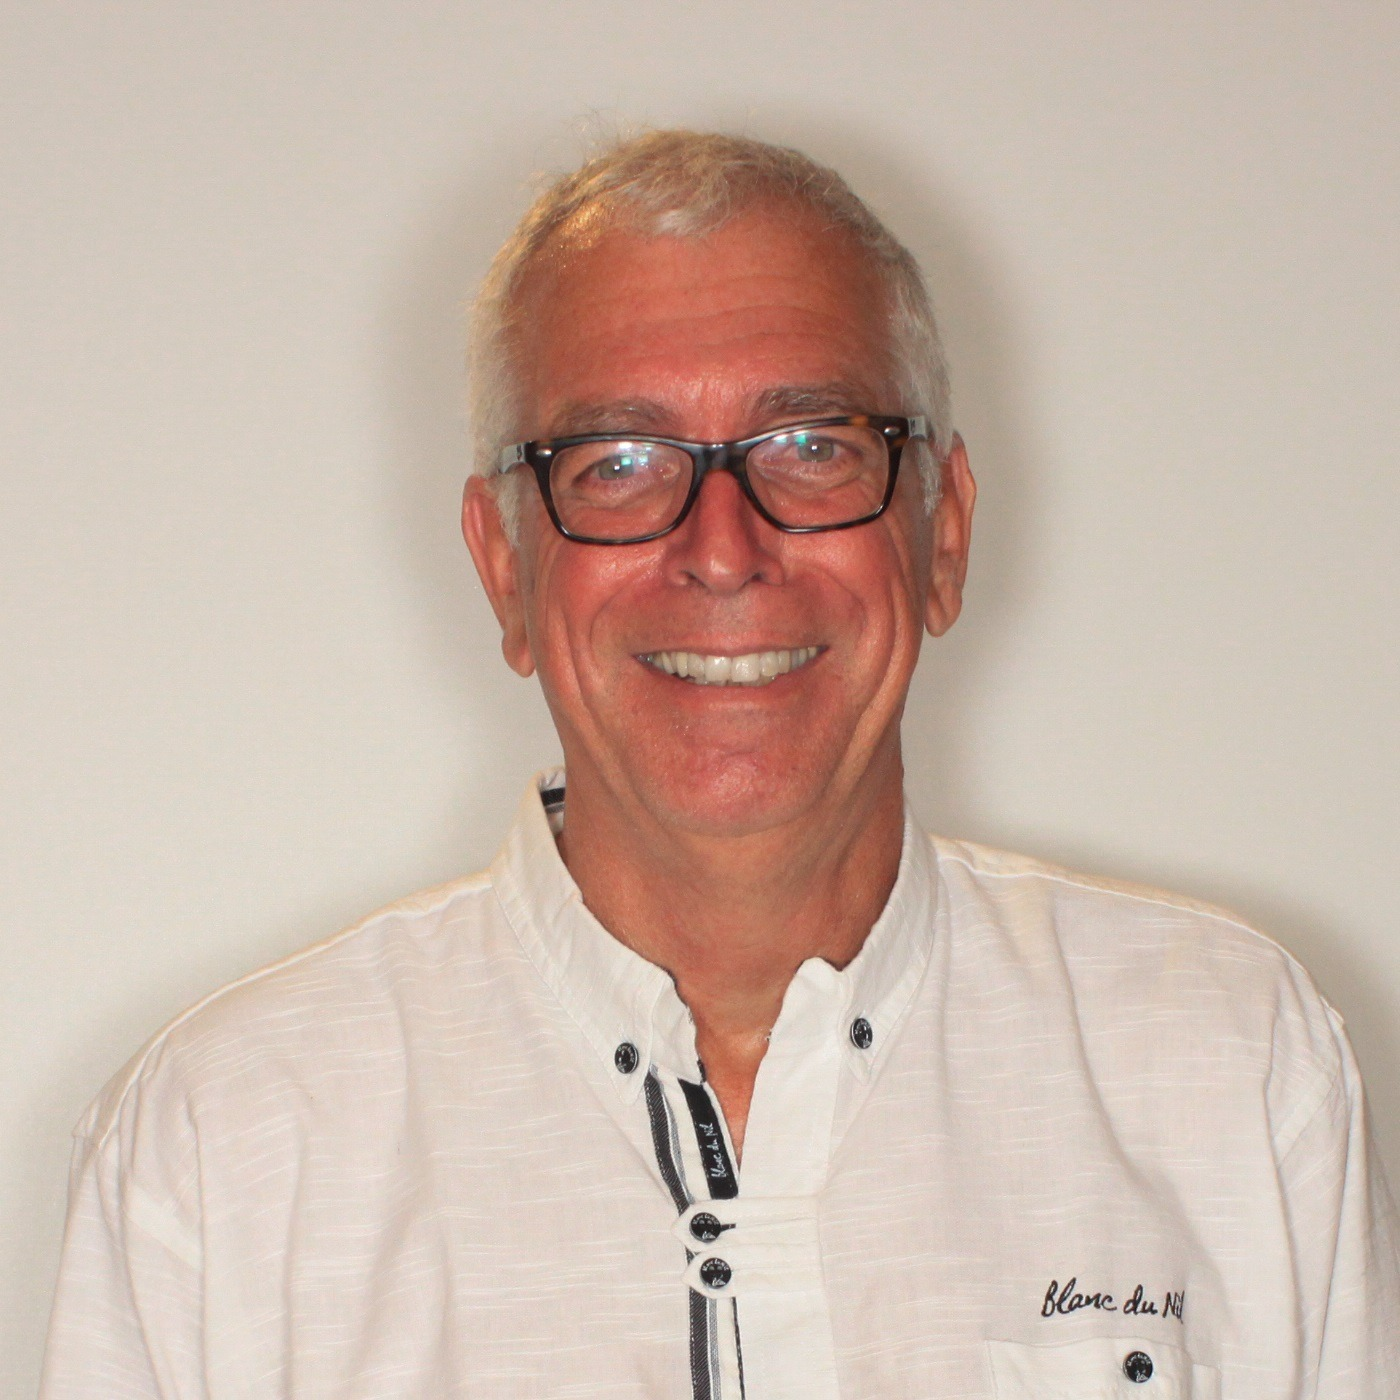 Paul Witte